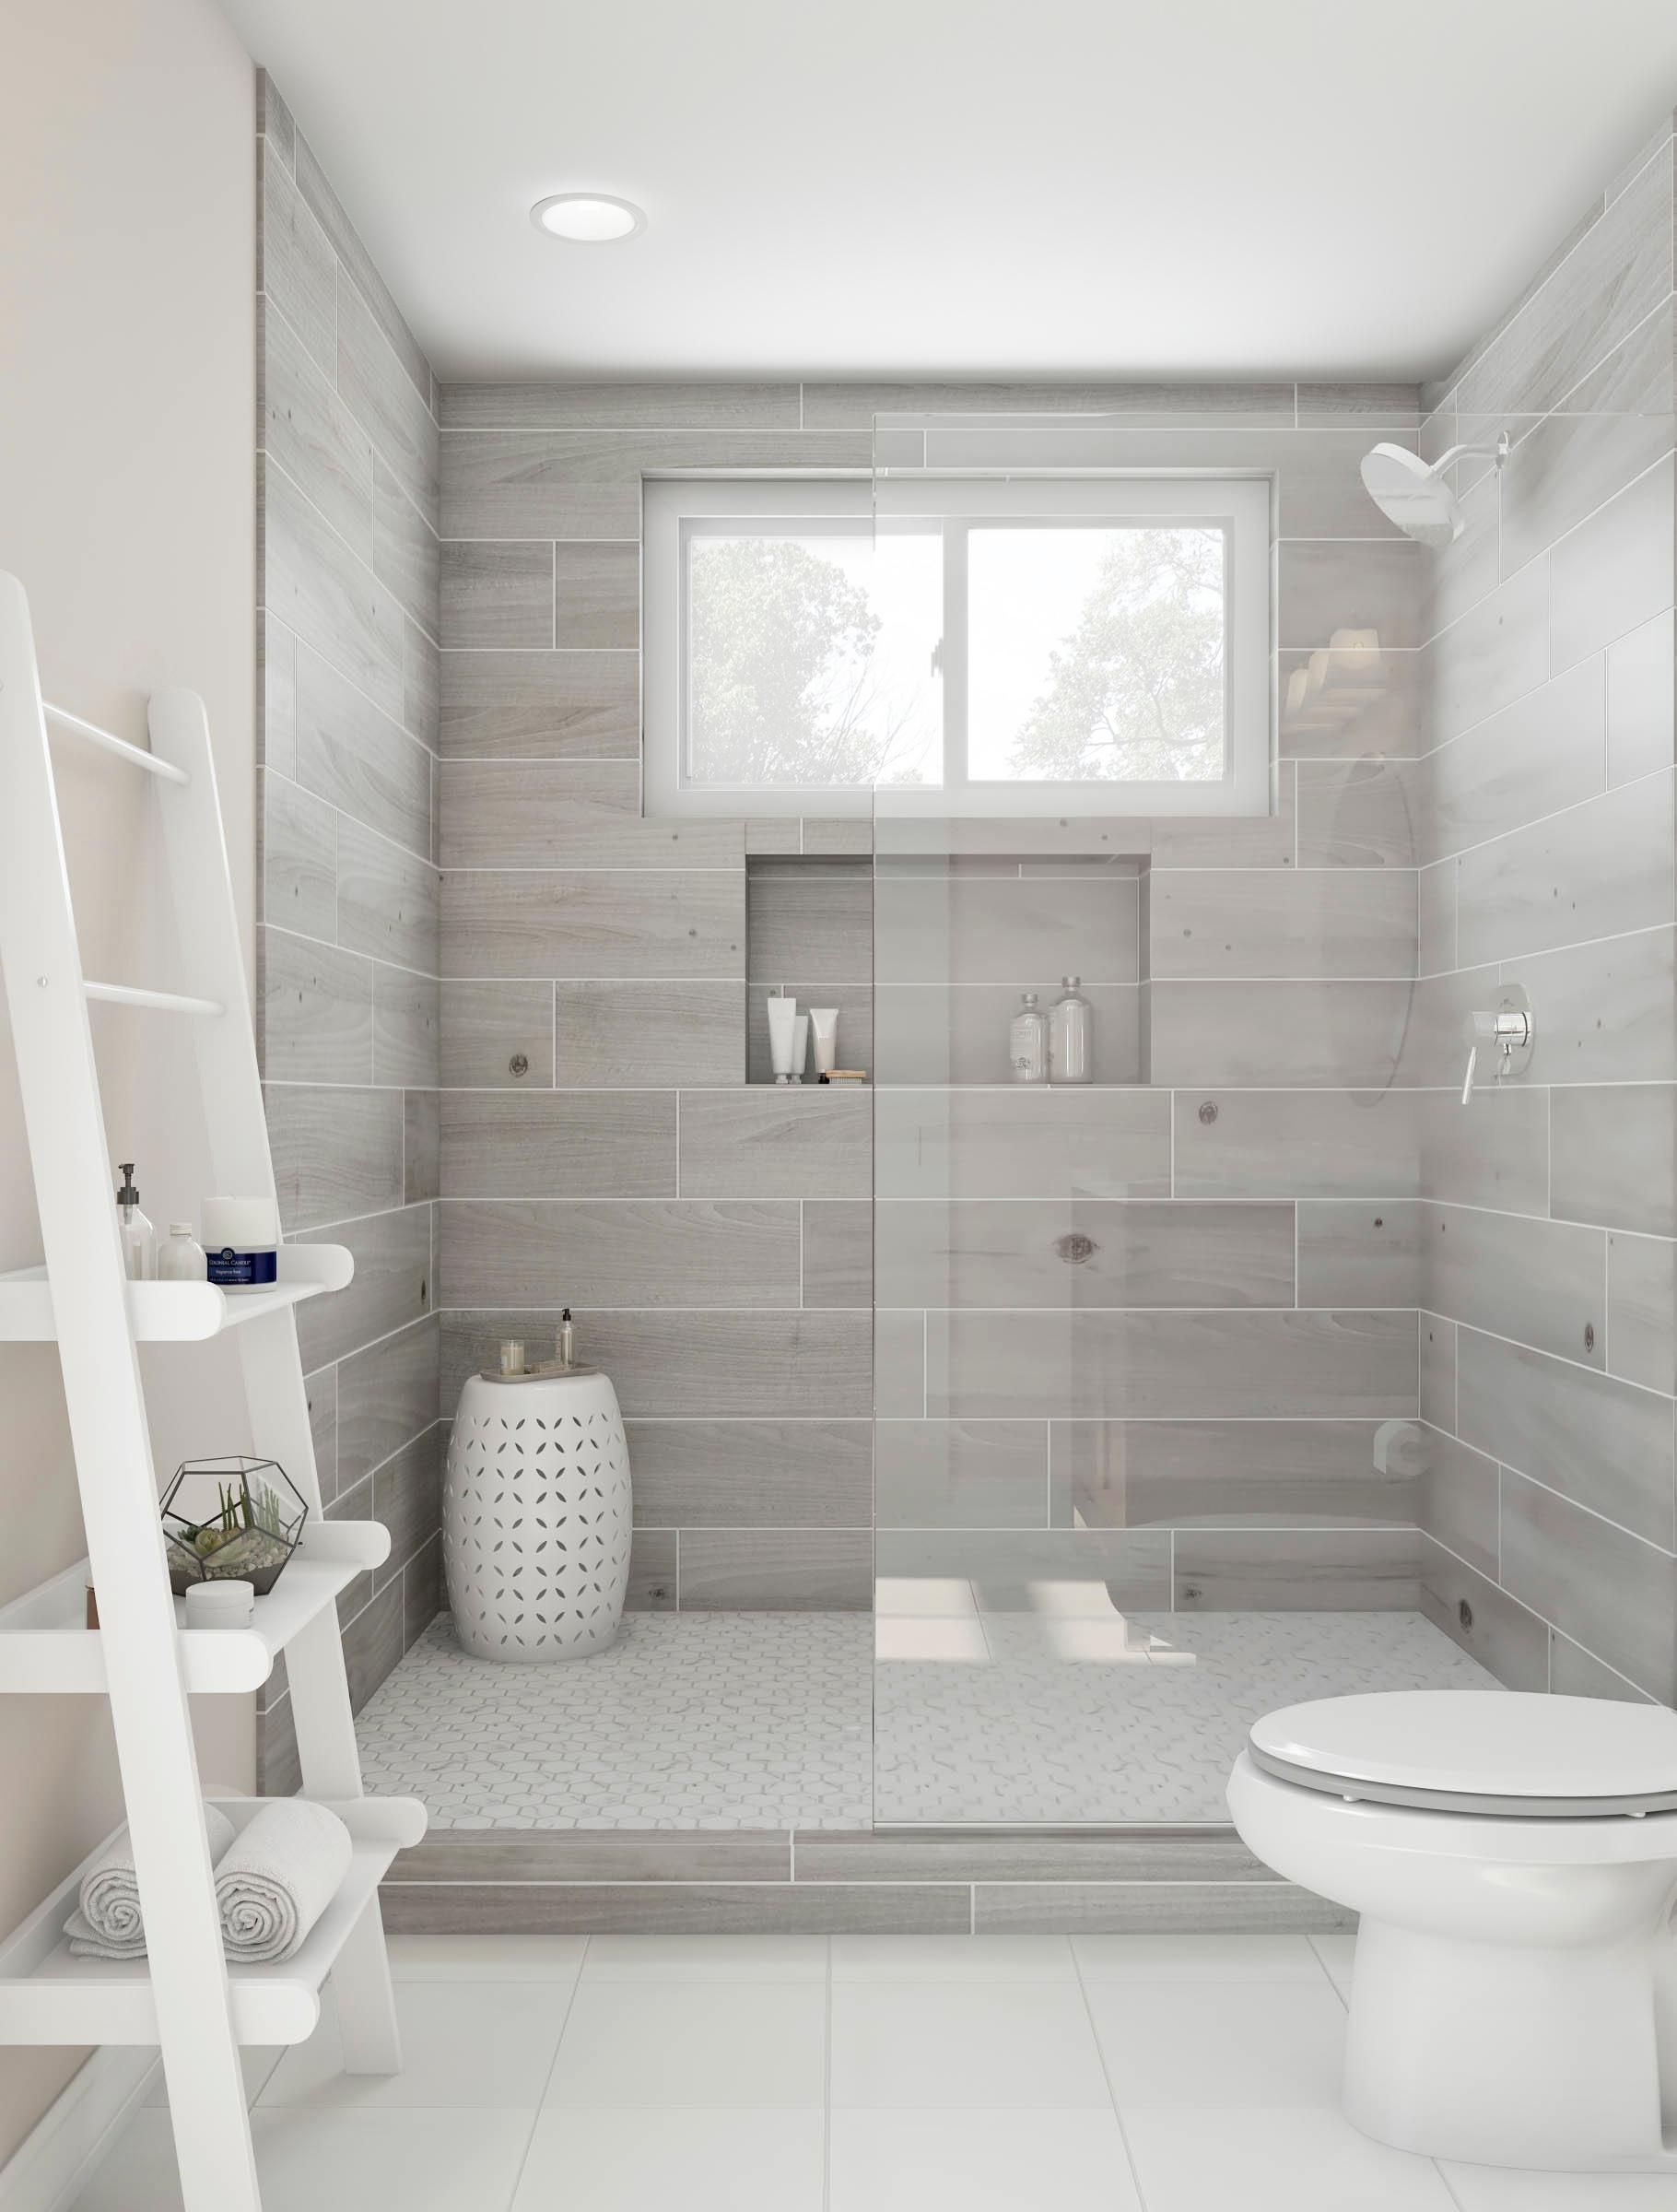 41 Minimalist Master Bathroom Remodel Ideas Zyhomy Unique Bathroom Tiles Bathroom Remodel Master Bathrooms Remodel